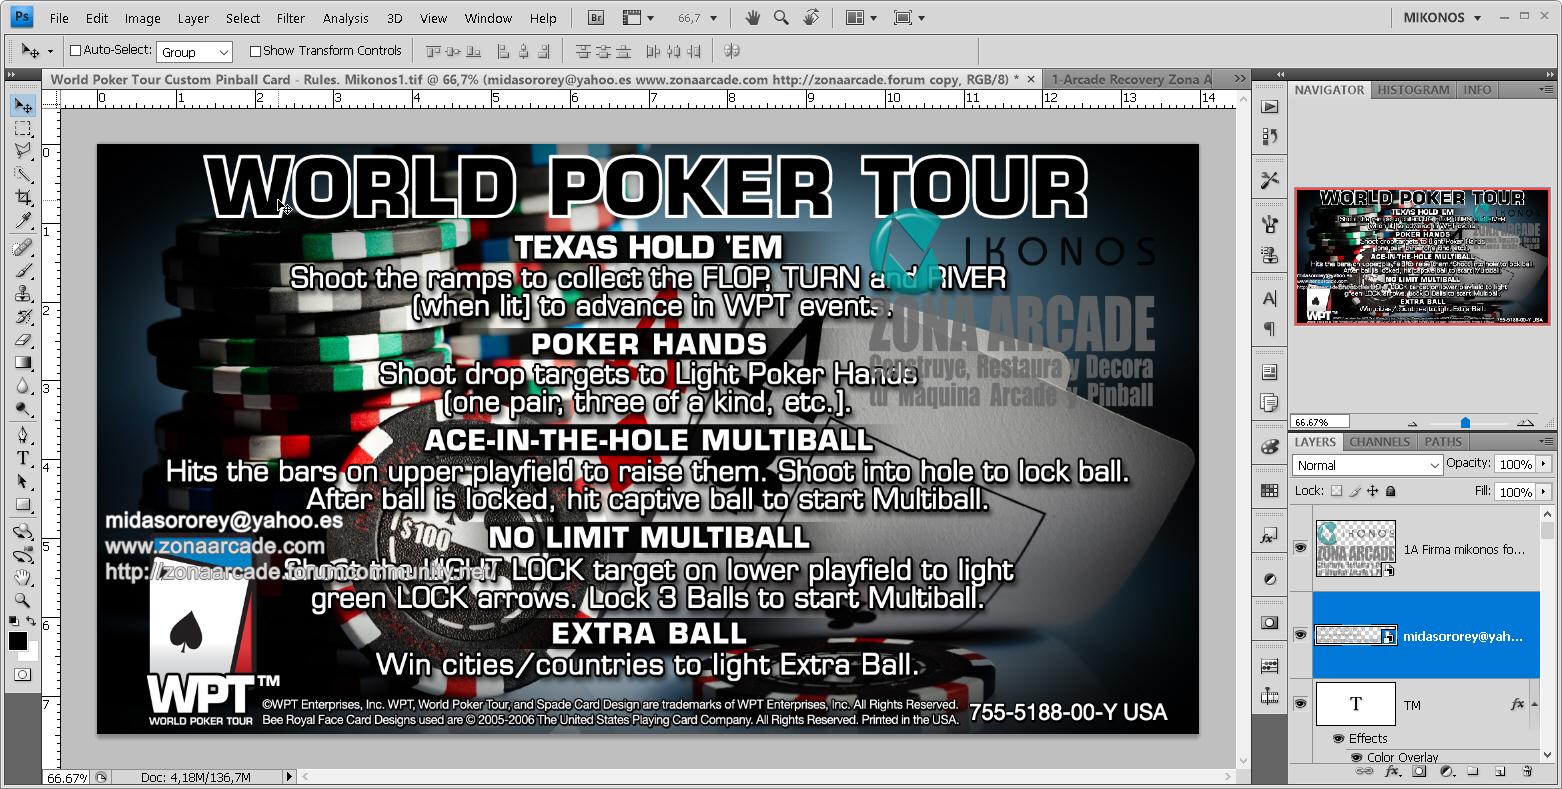 World Poker Tour Pinball Card Customized - Rules. Mikonos1